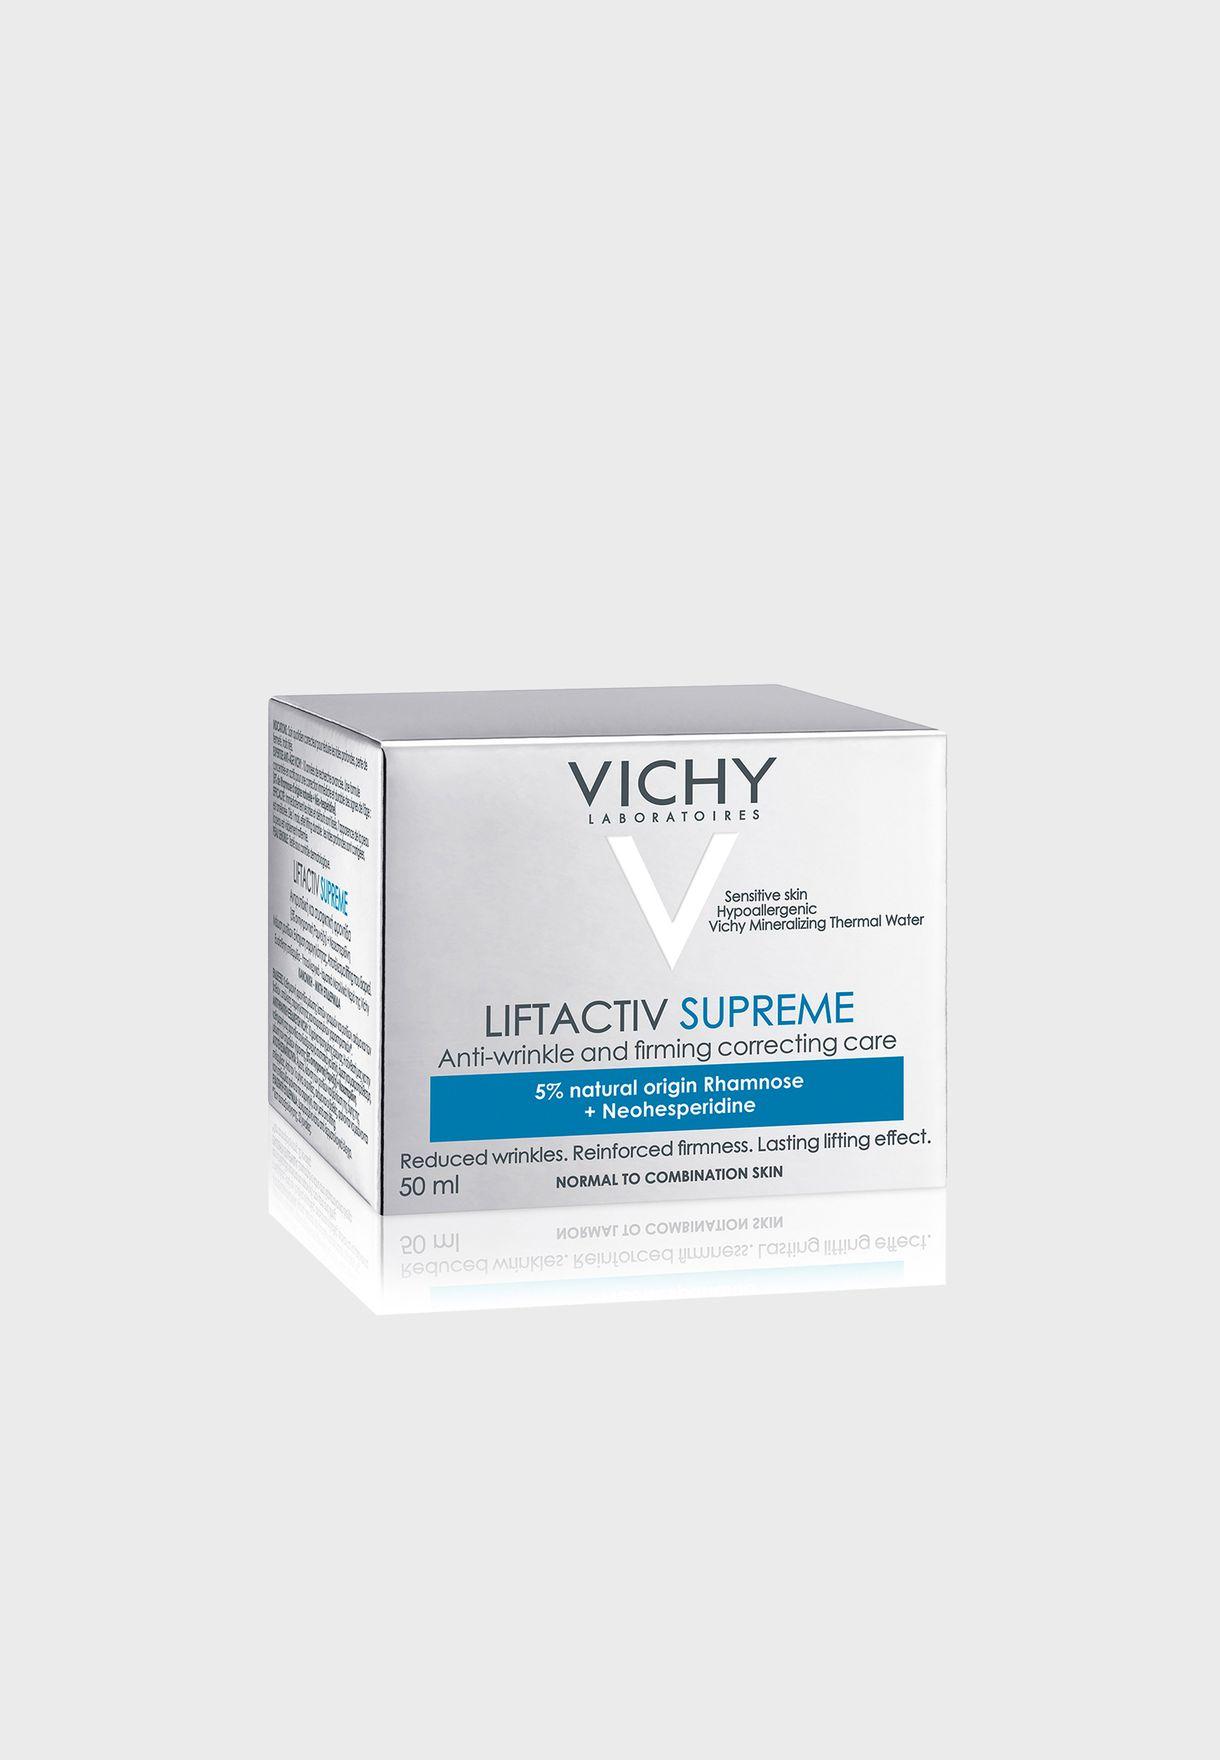 Liftactiv Supreme Firming Cream 50ml